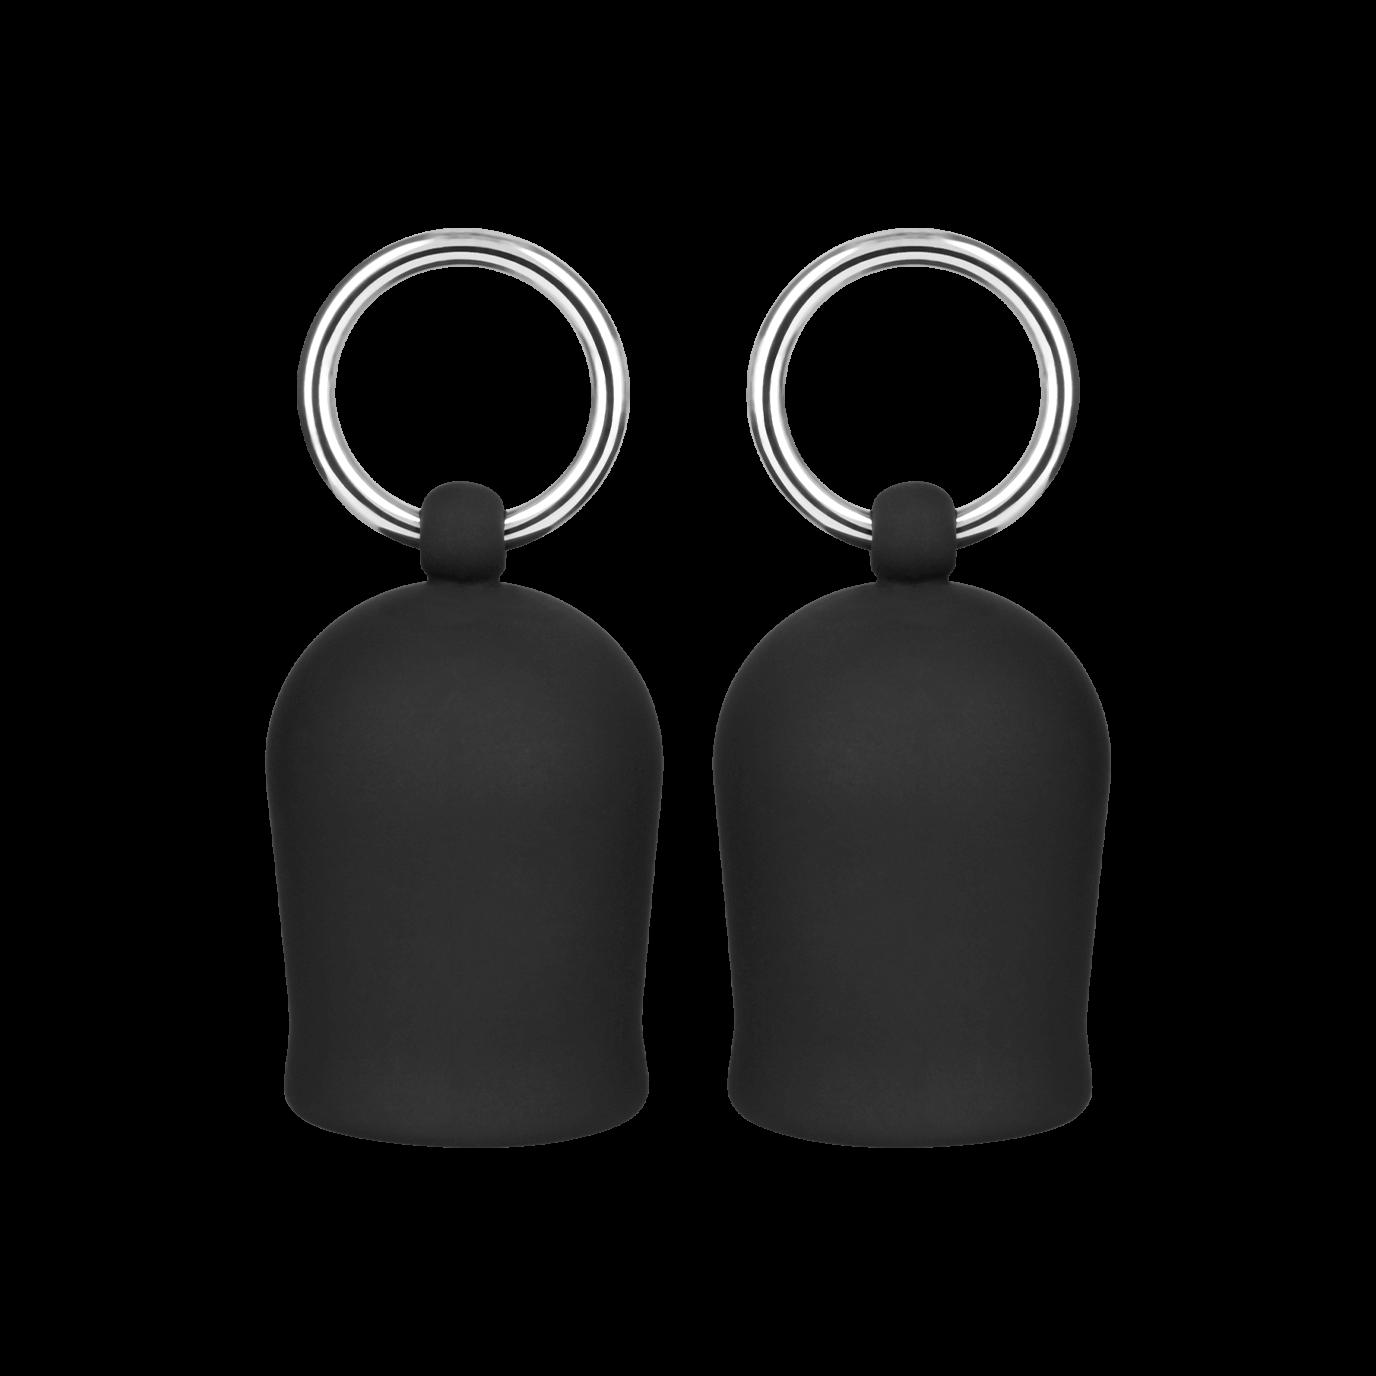 Rimba Silikon-Nippelsauger mit Ring, schwarz jetztbilligerkaufen